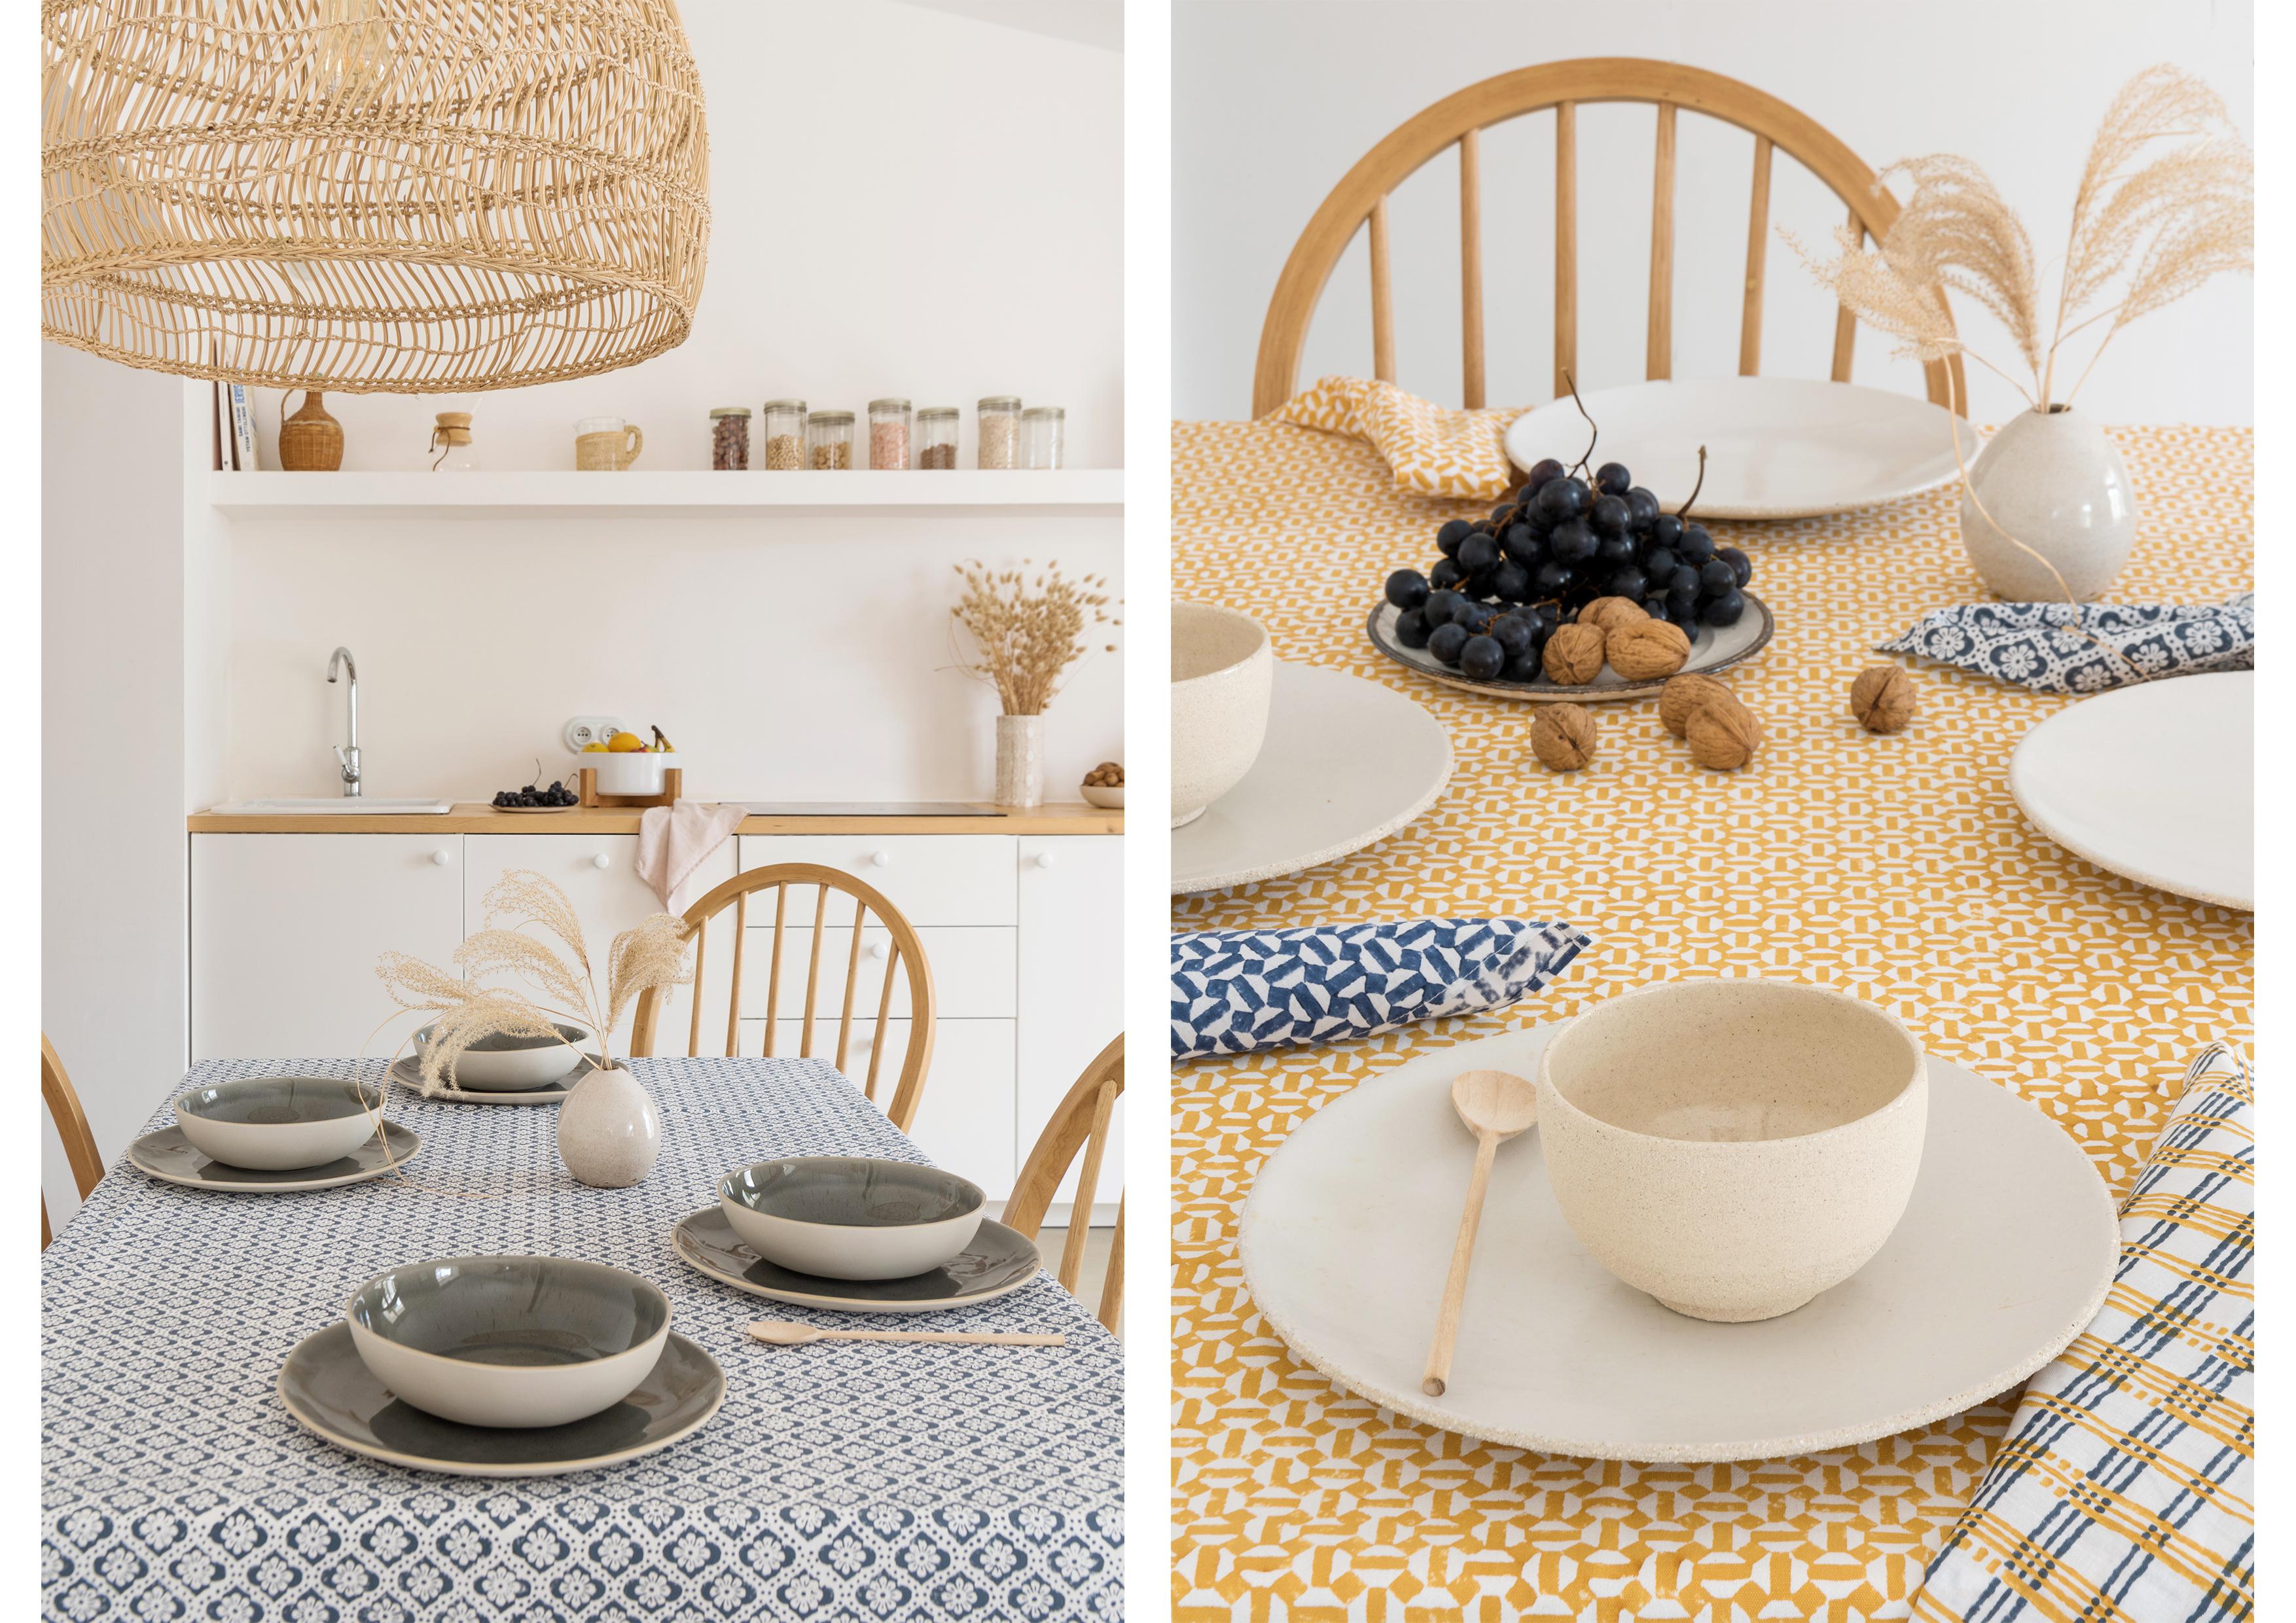 organic table linen and table jamini